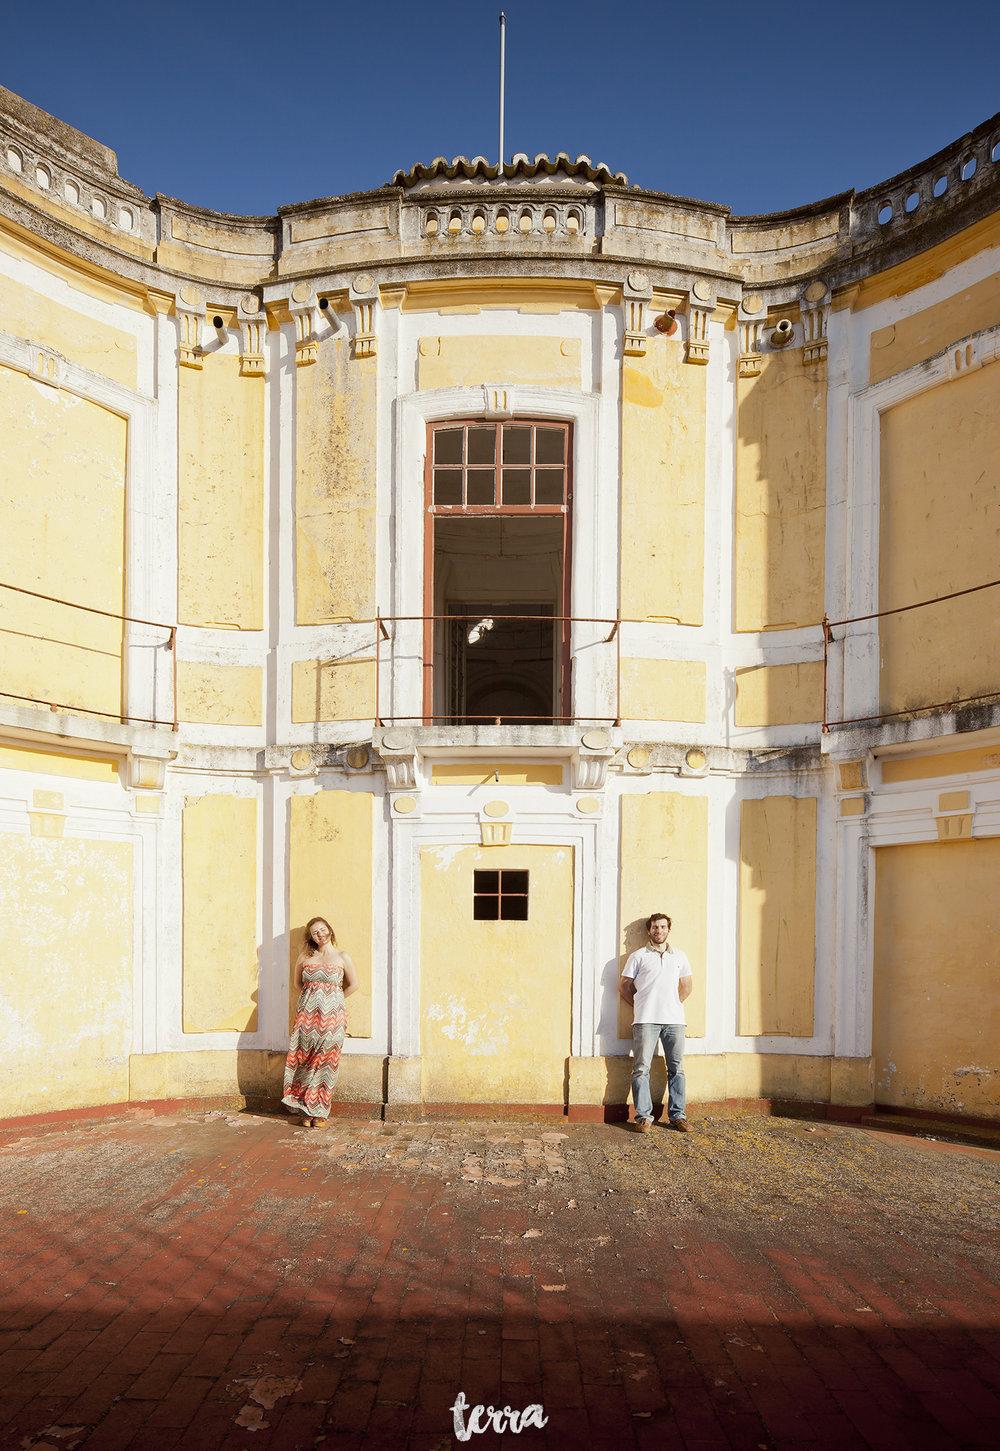 sessao-fotografica-casal-forte-nossa-senhora-graca-elvas-terra-fotografia-0037.jpg